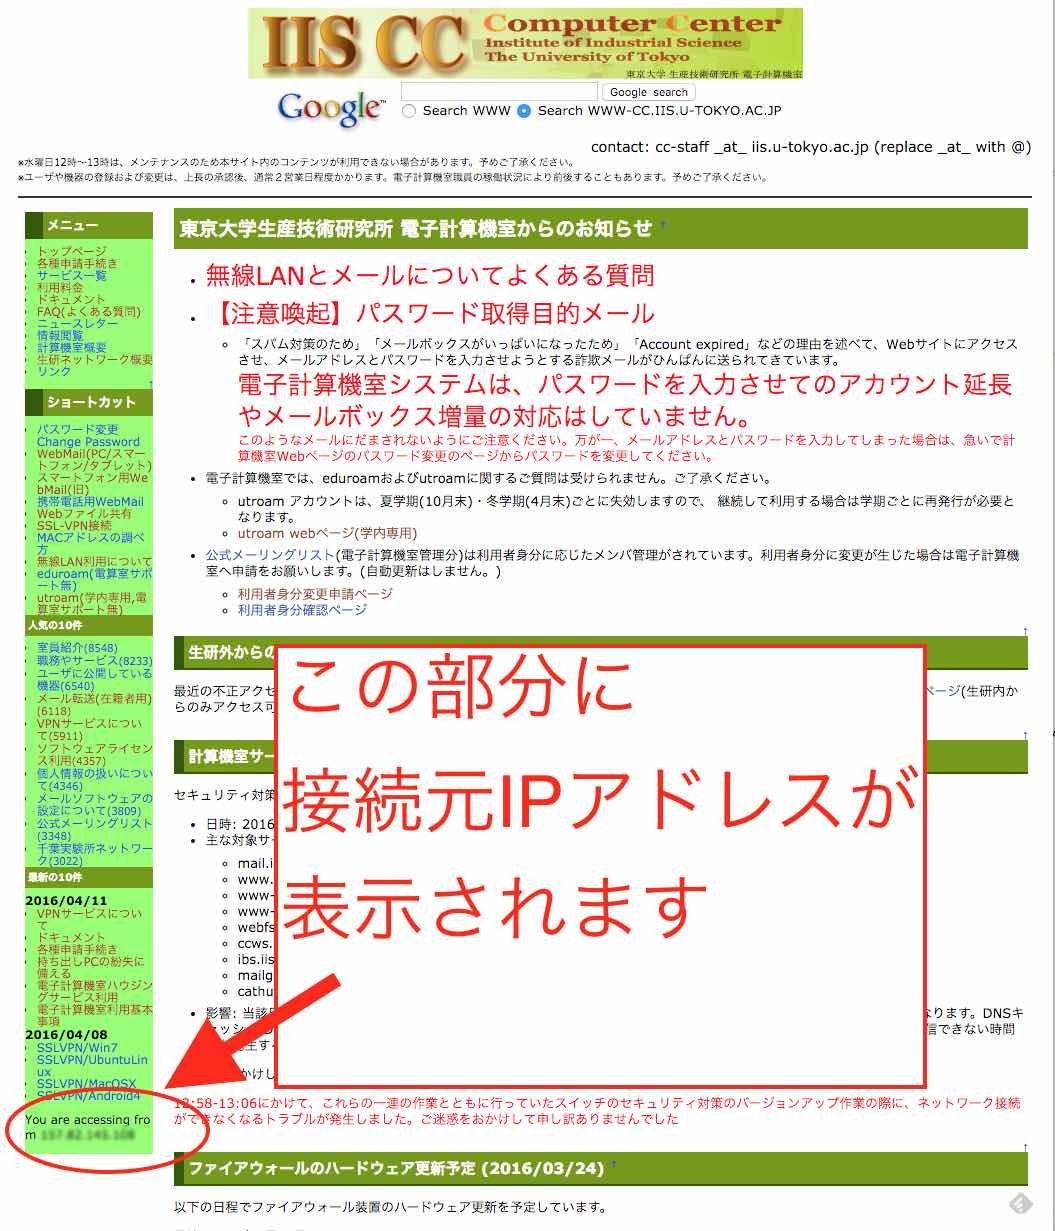 check-ip-1.jpg